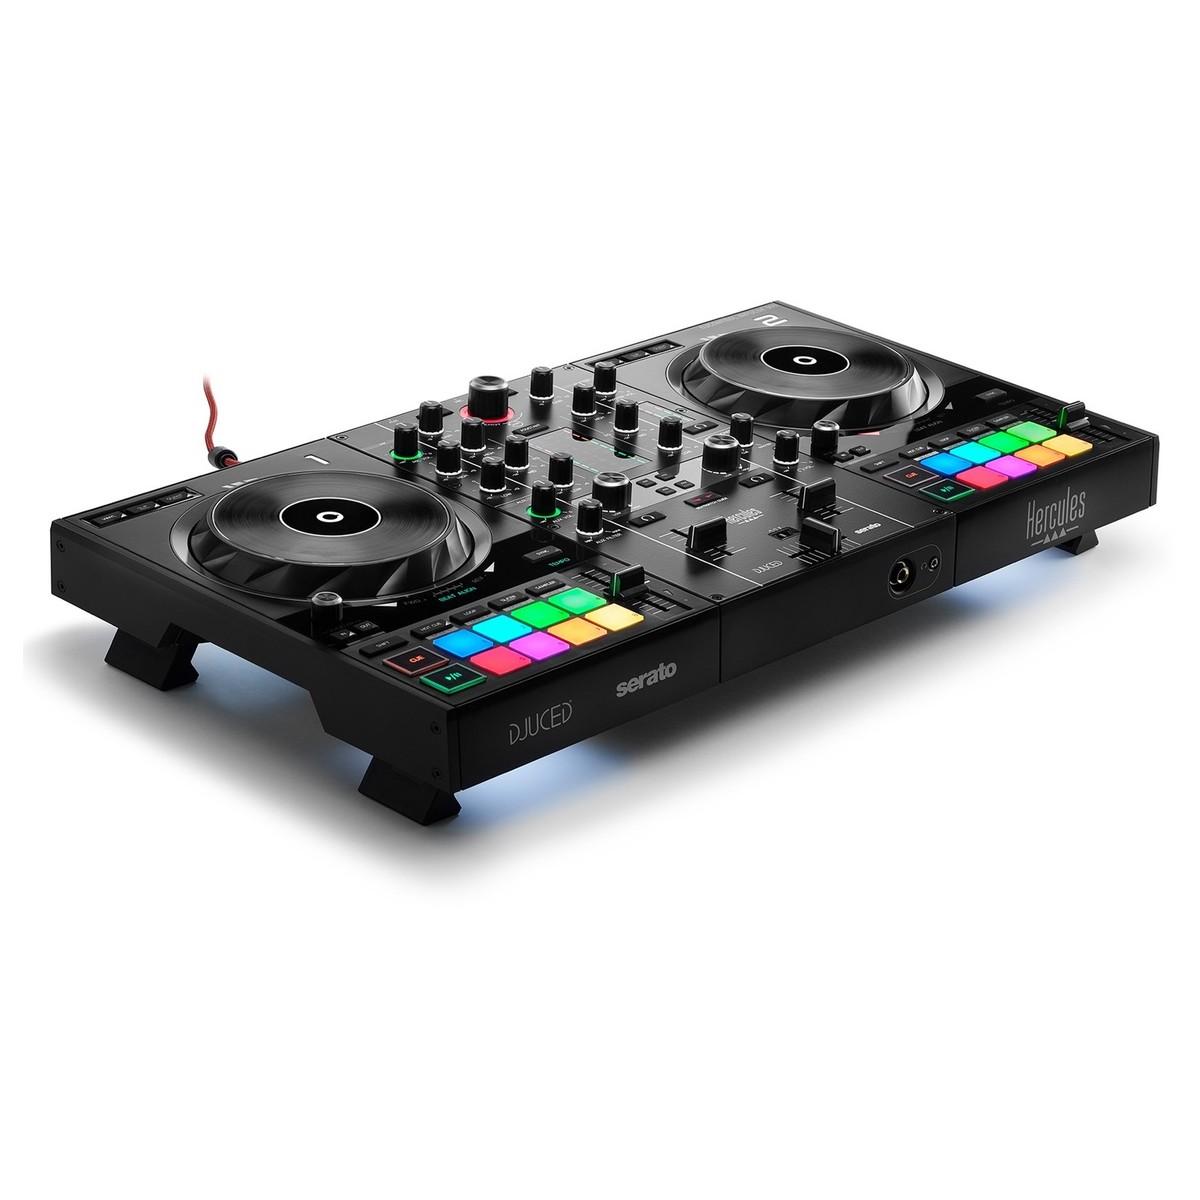 HERCULES DJ CONTROL INPULSE 500 CONTROLLER DIGITALE 2 DECK USB PER DJ 1